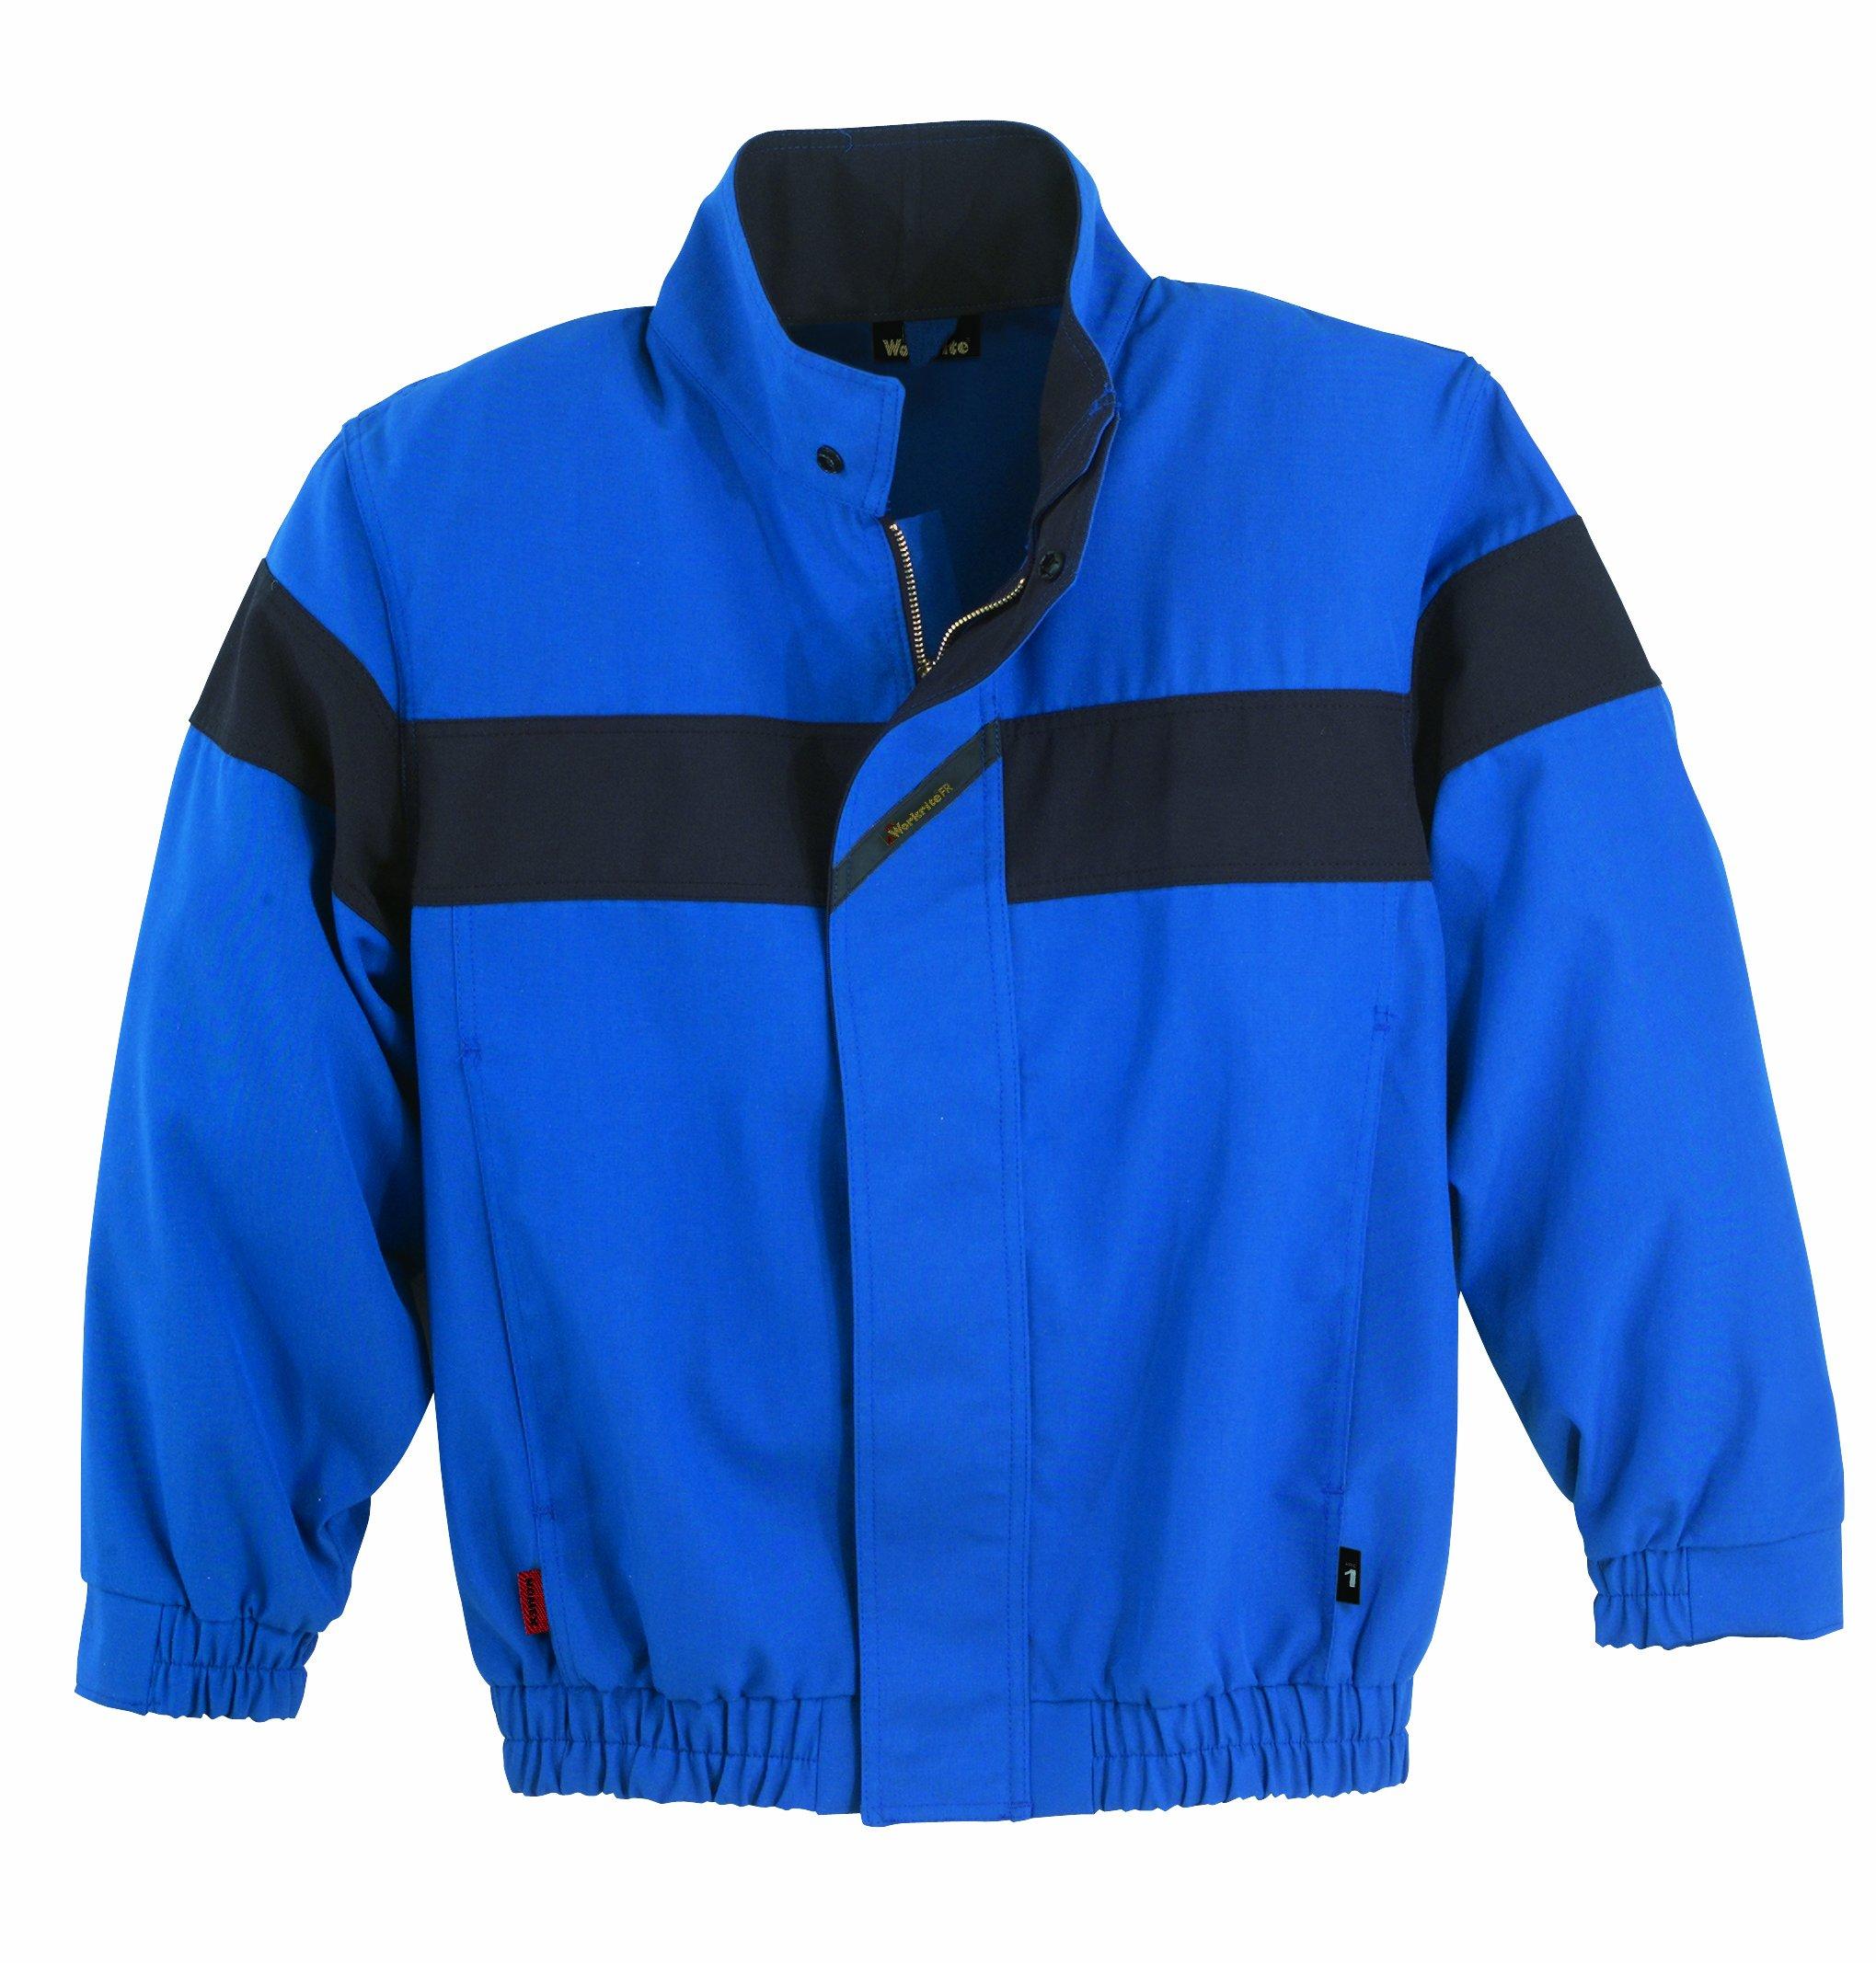 Workrite FR Flame Resistant 6 oz Nomex IIIA Work Jacket, Elastic Cuff, Large, Regular Length, Navy Blue